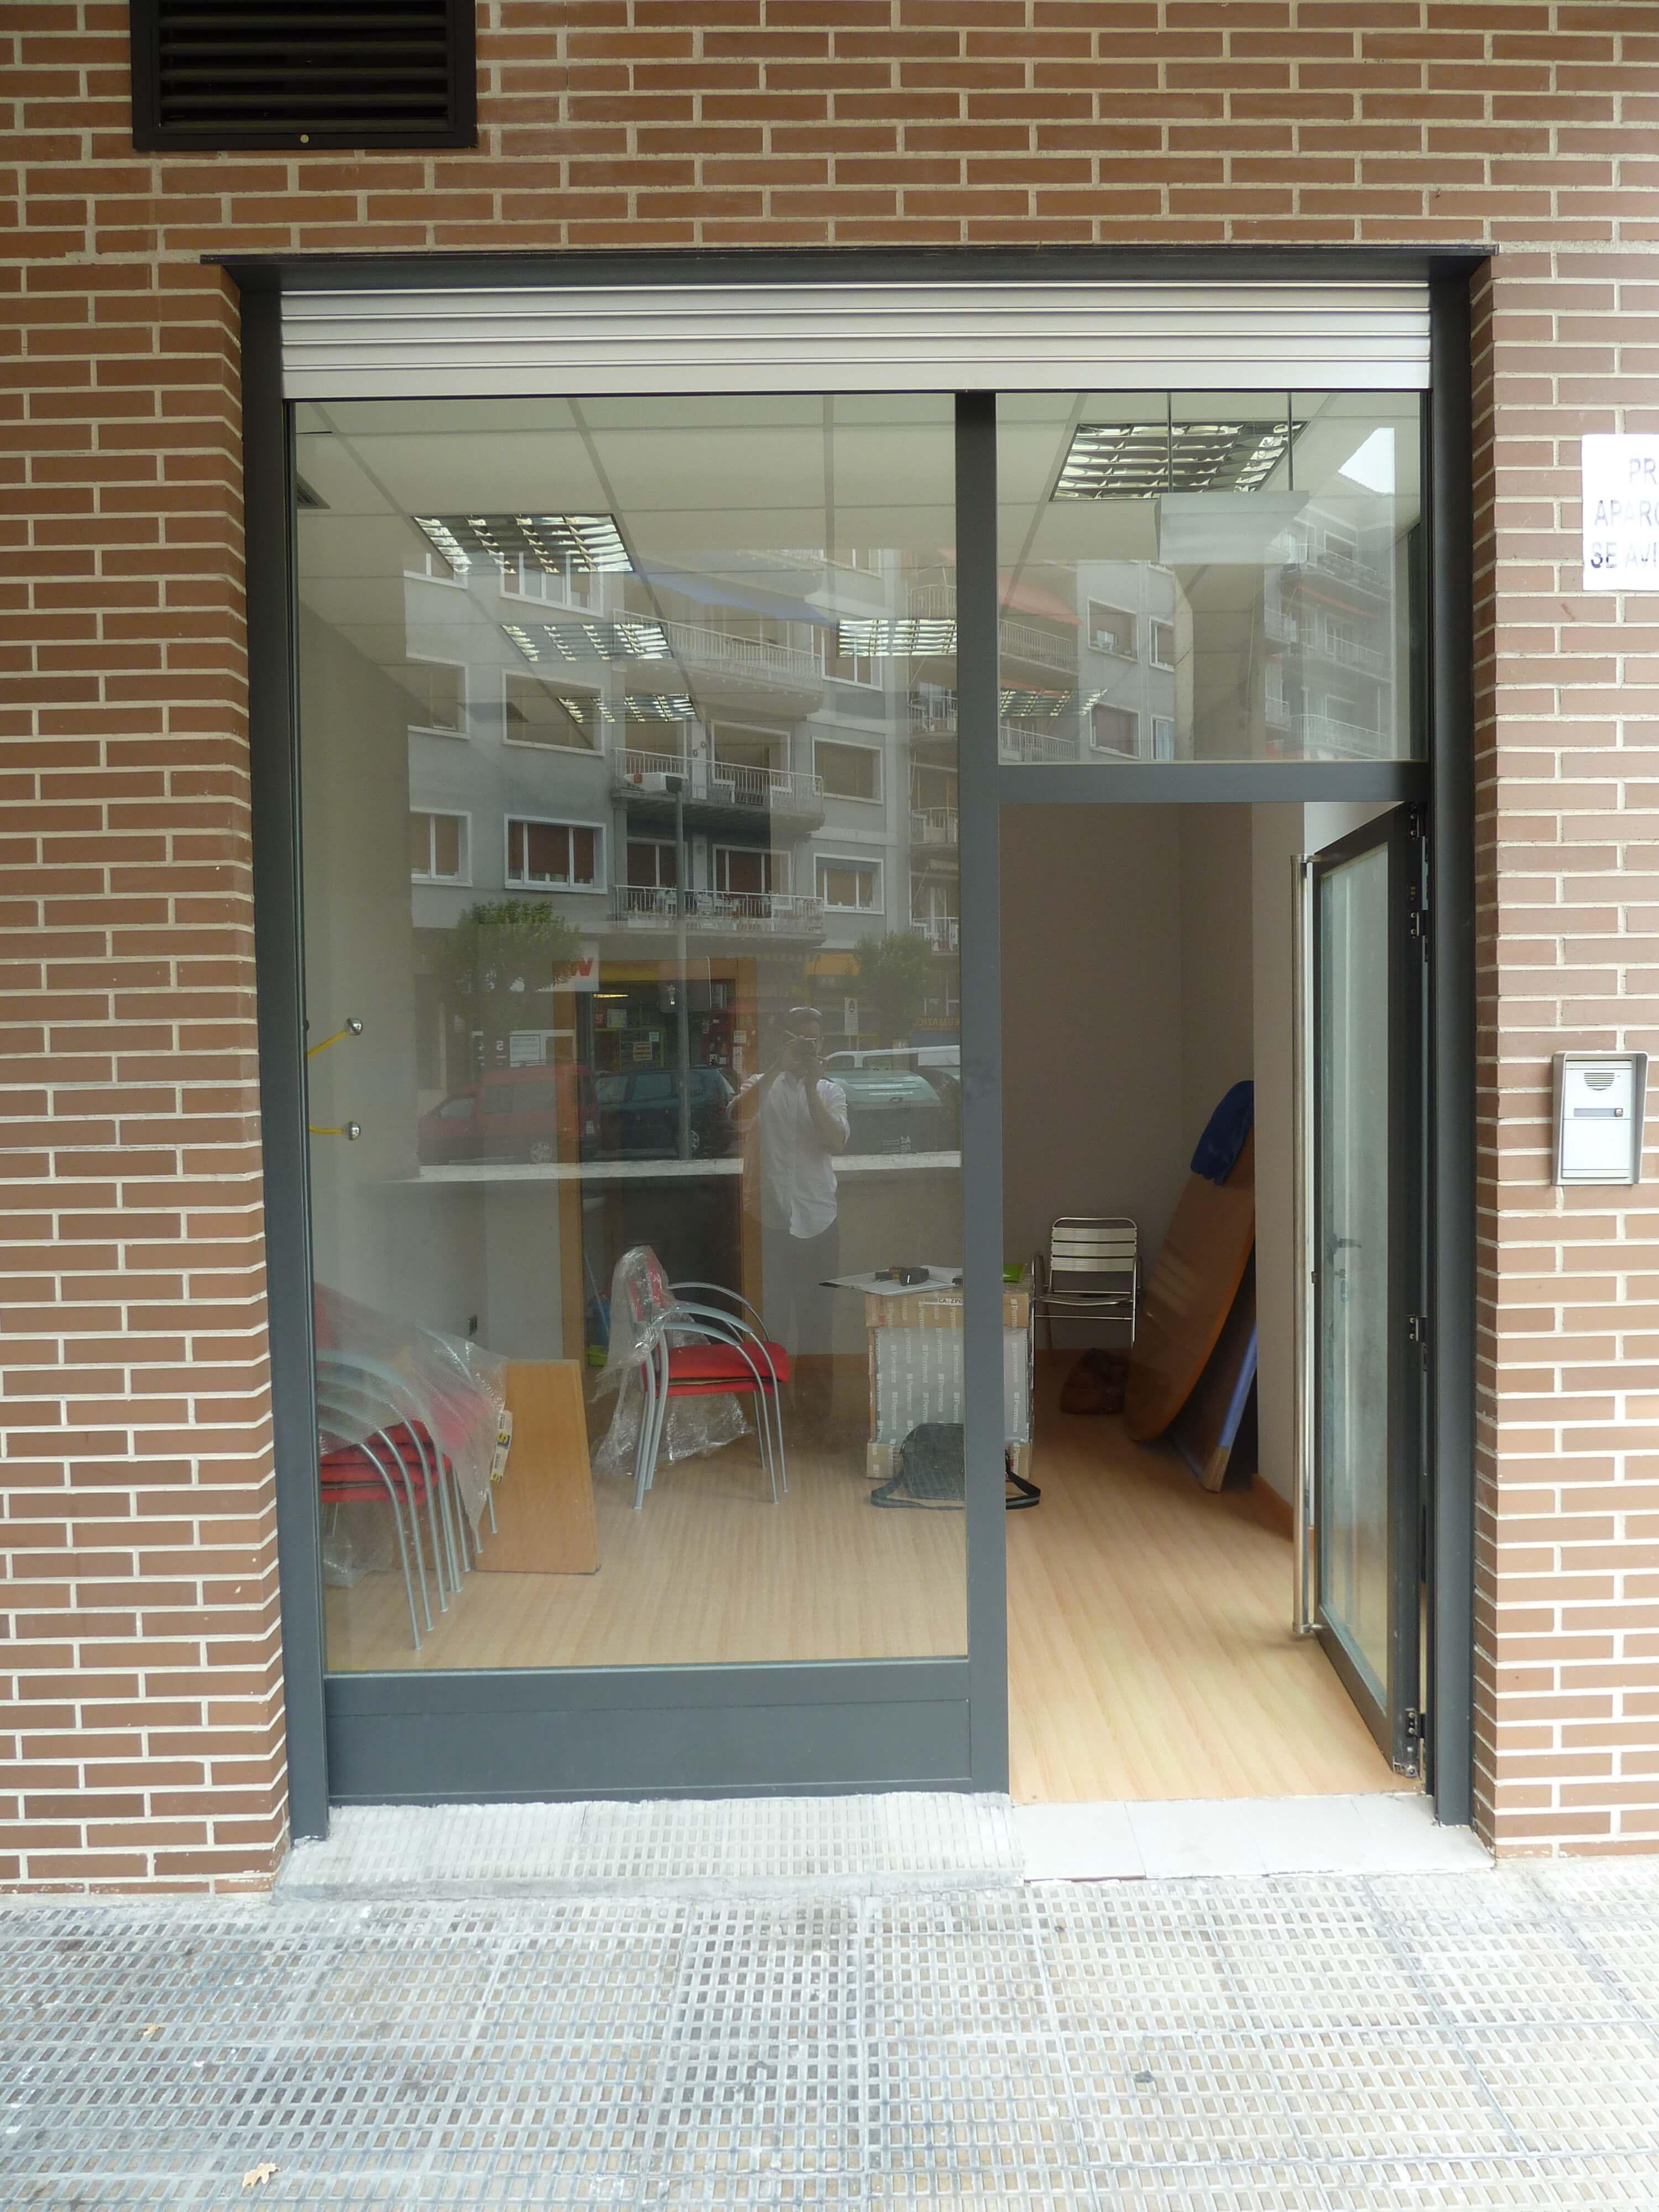 Habilitación de local para oficinas